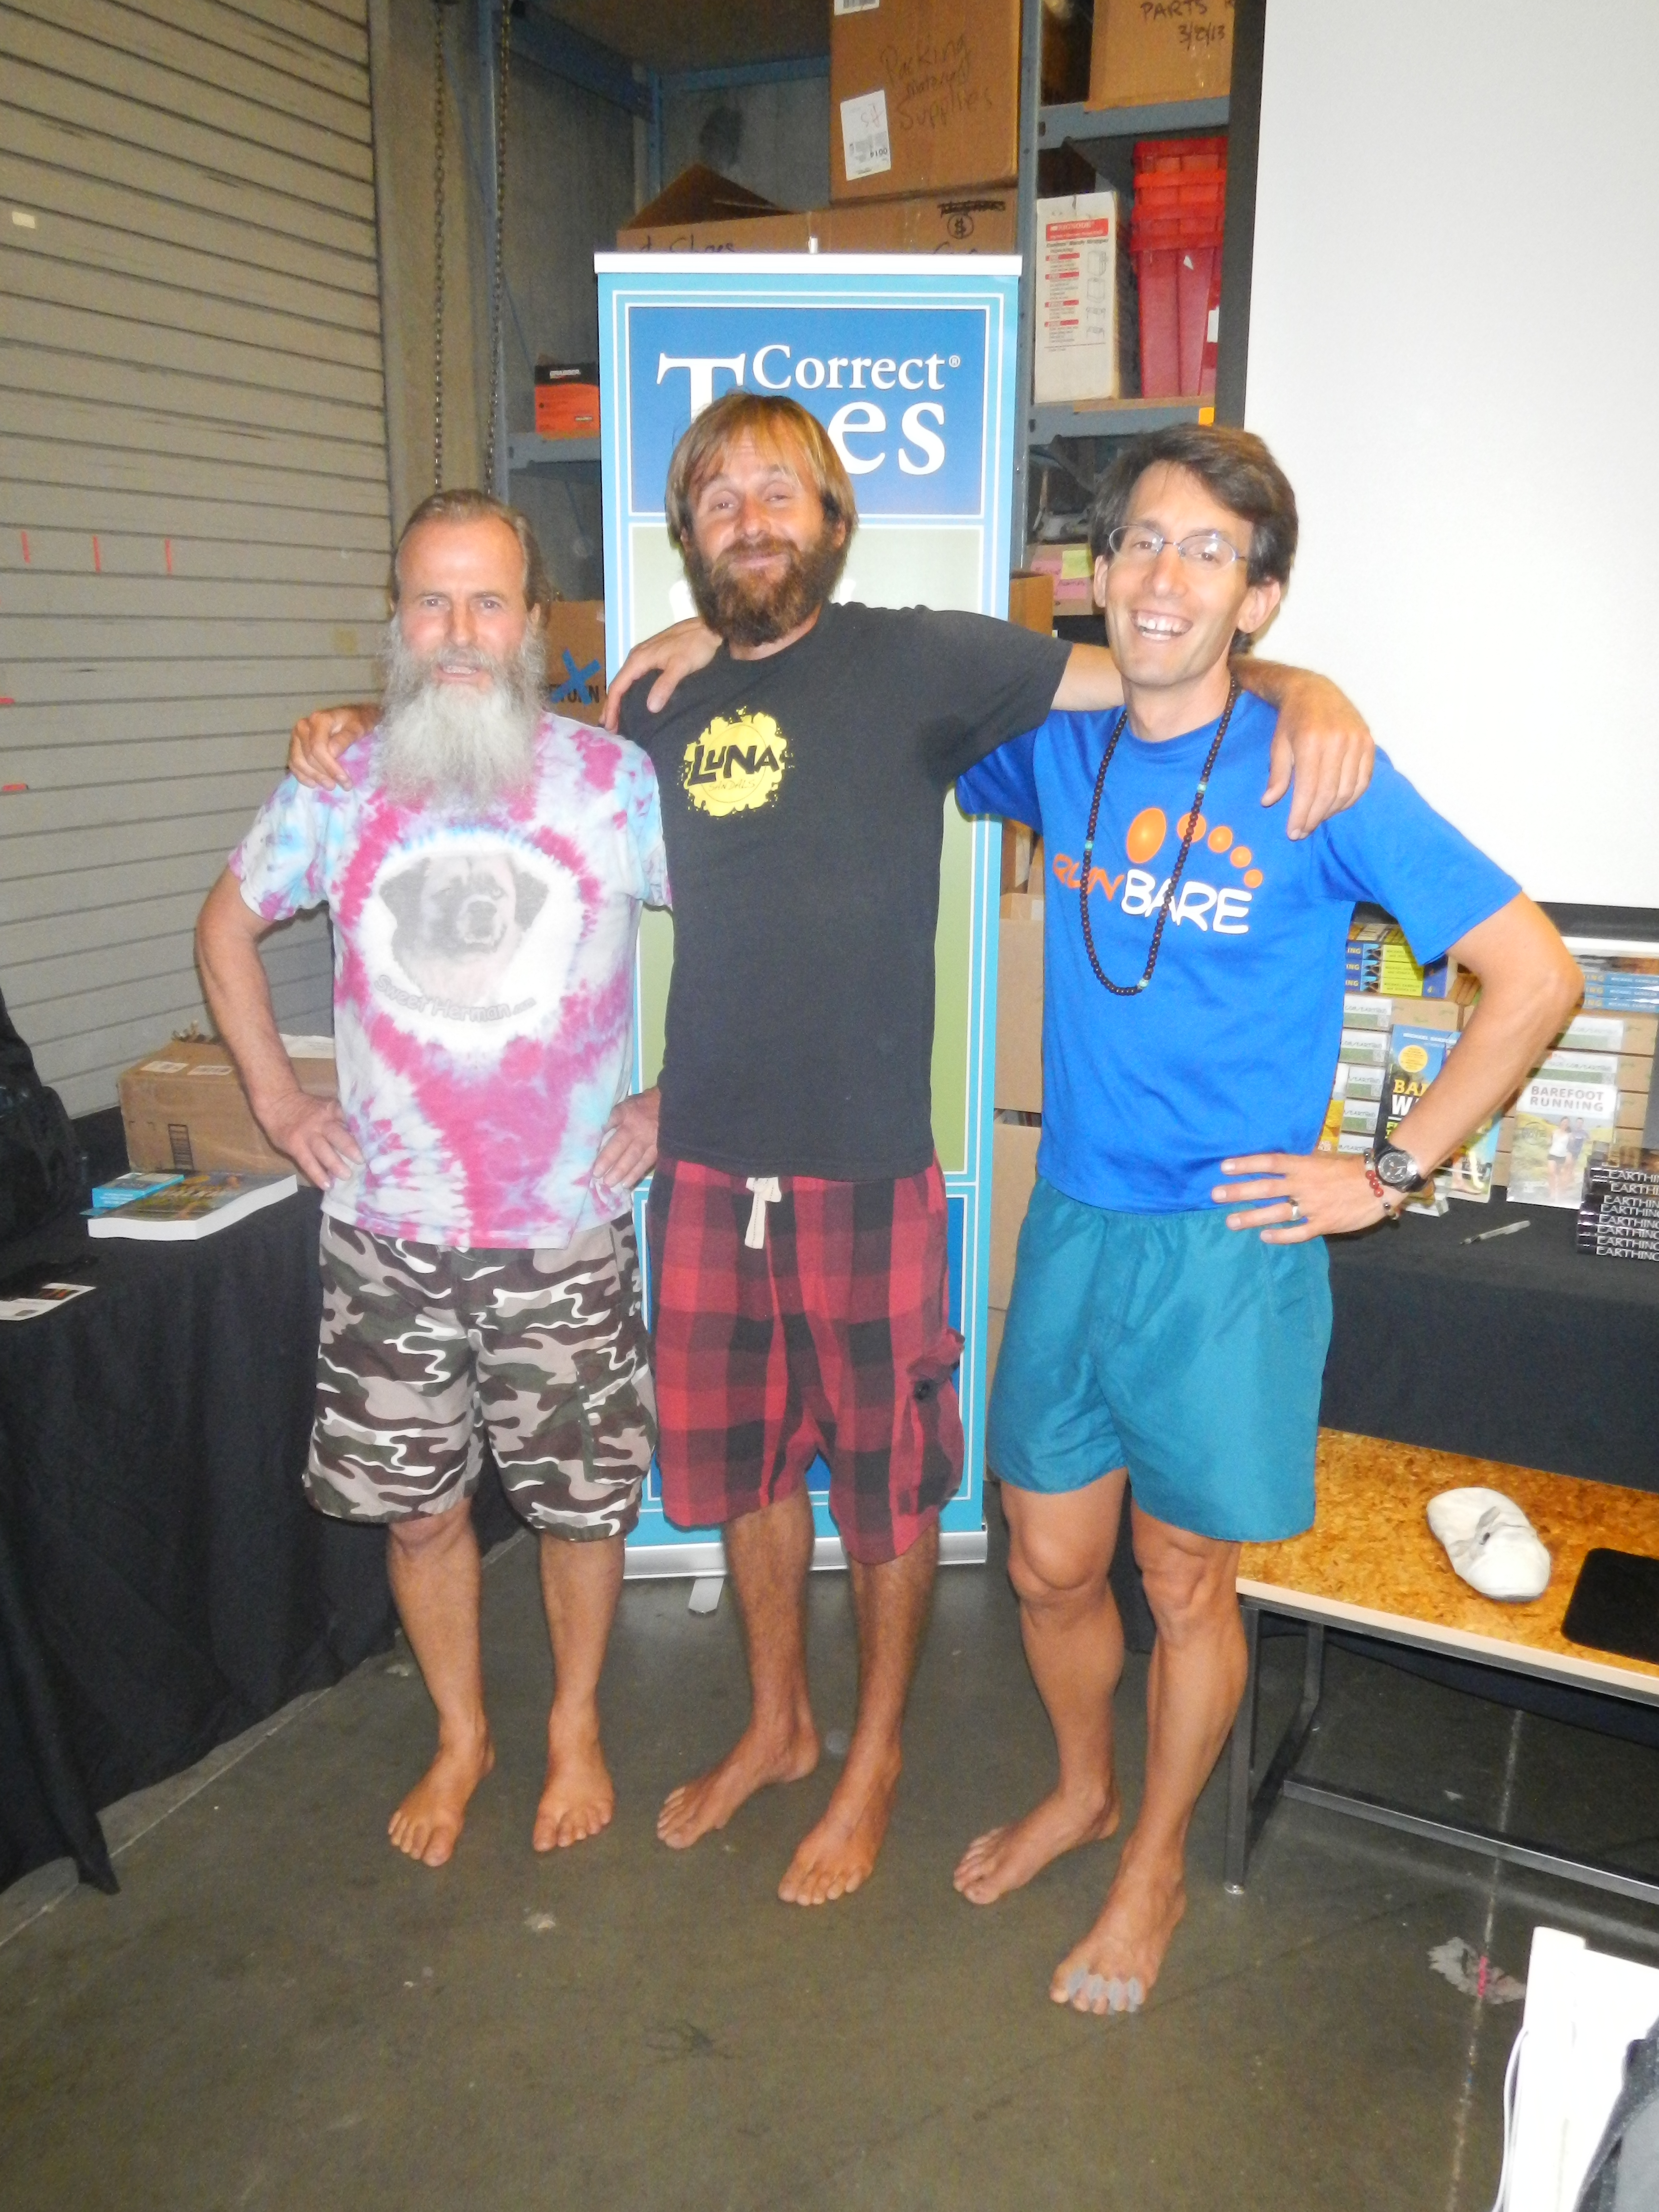 Ken Bob, Patrick, and Michael